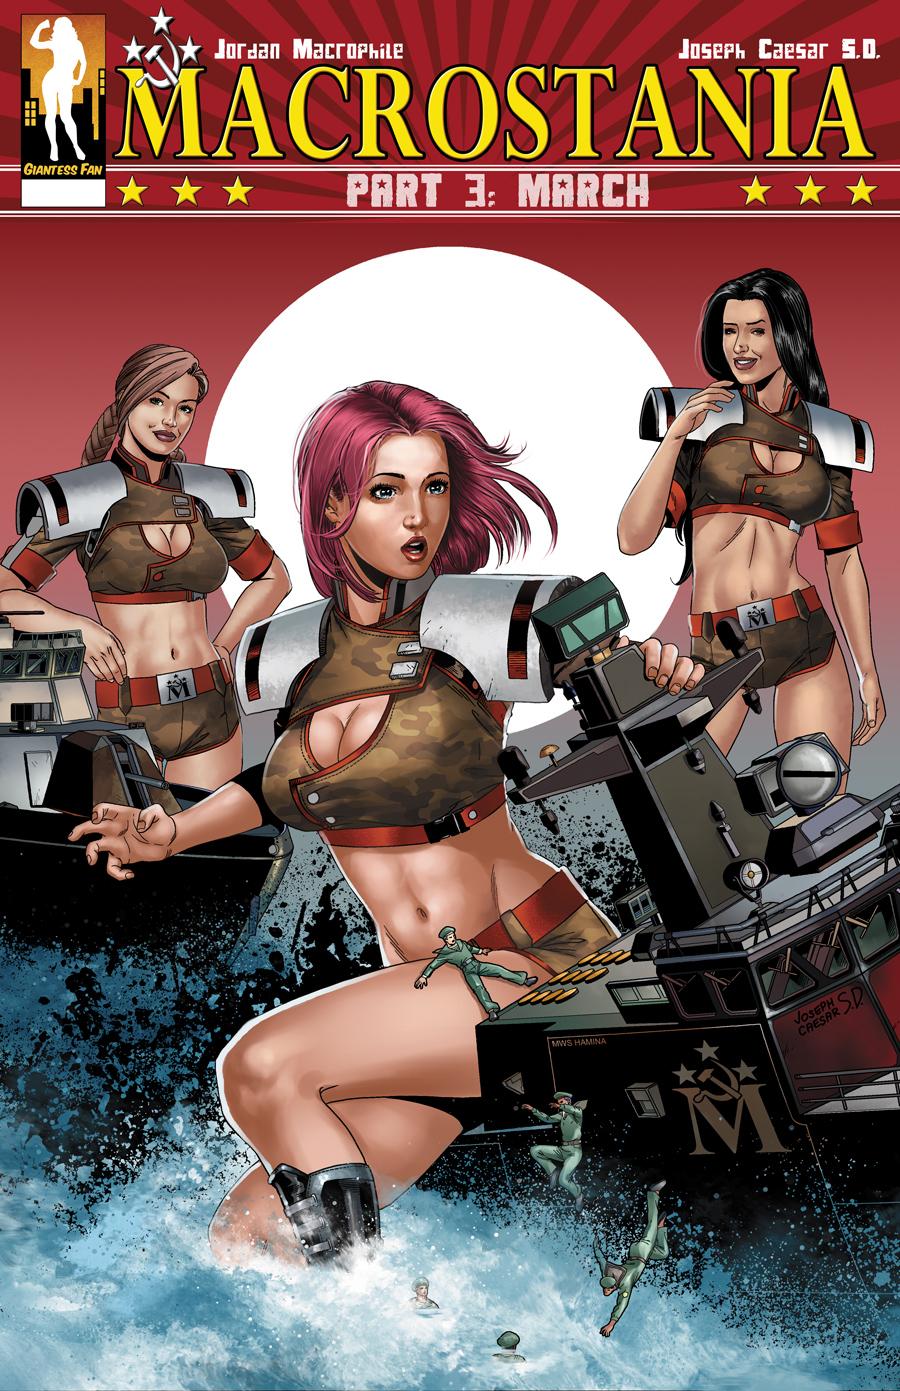 Macrostania 3 - March by giantess-fan-comics